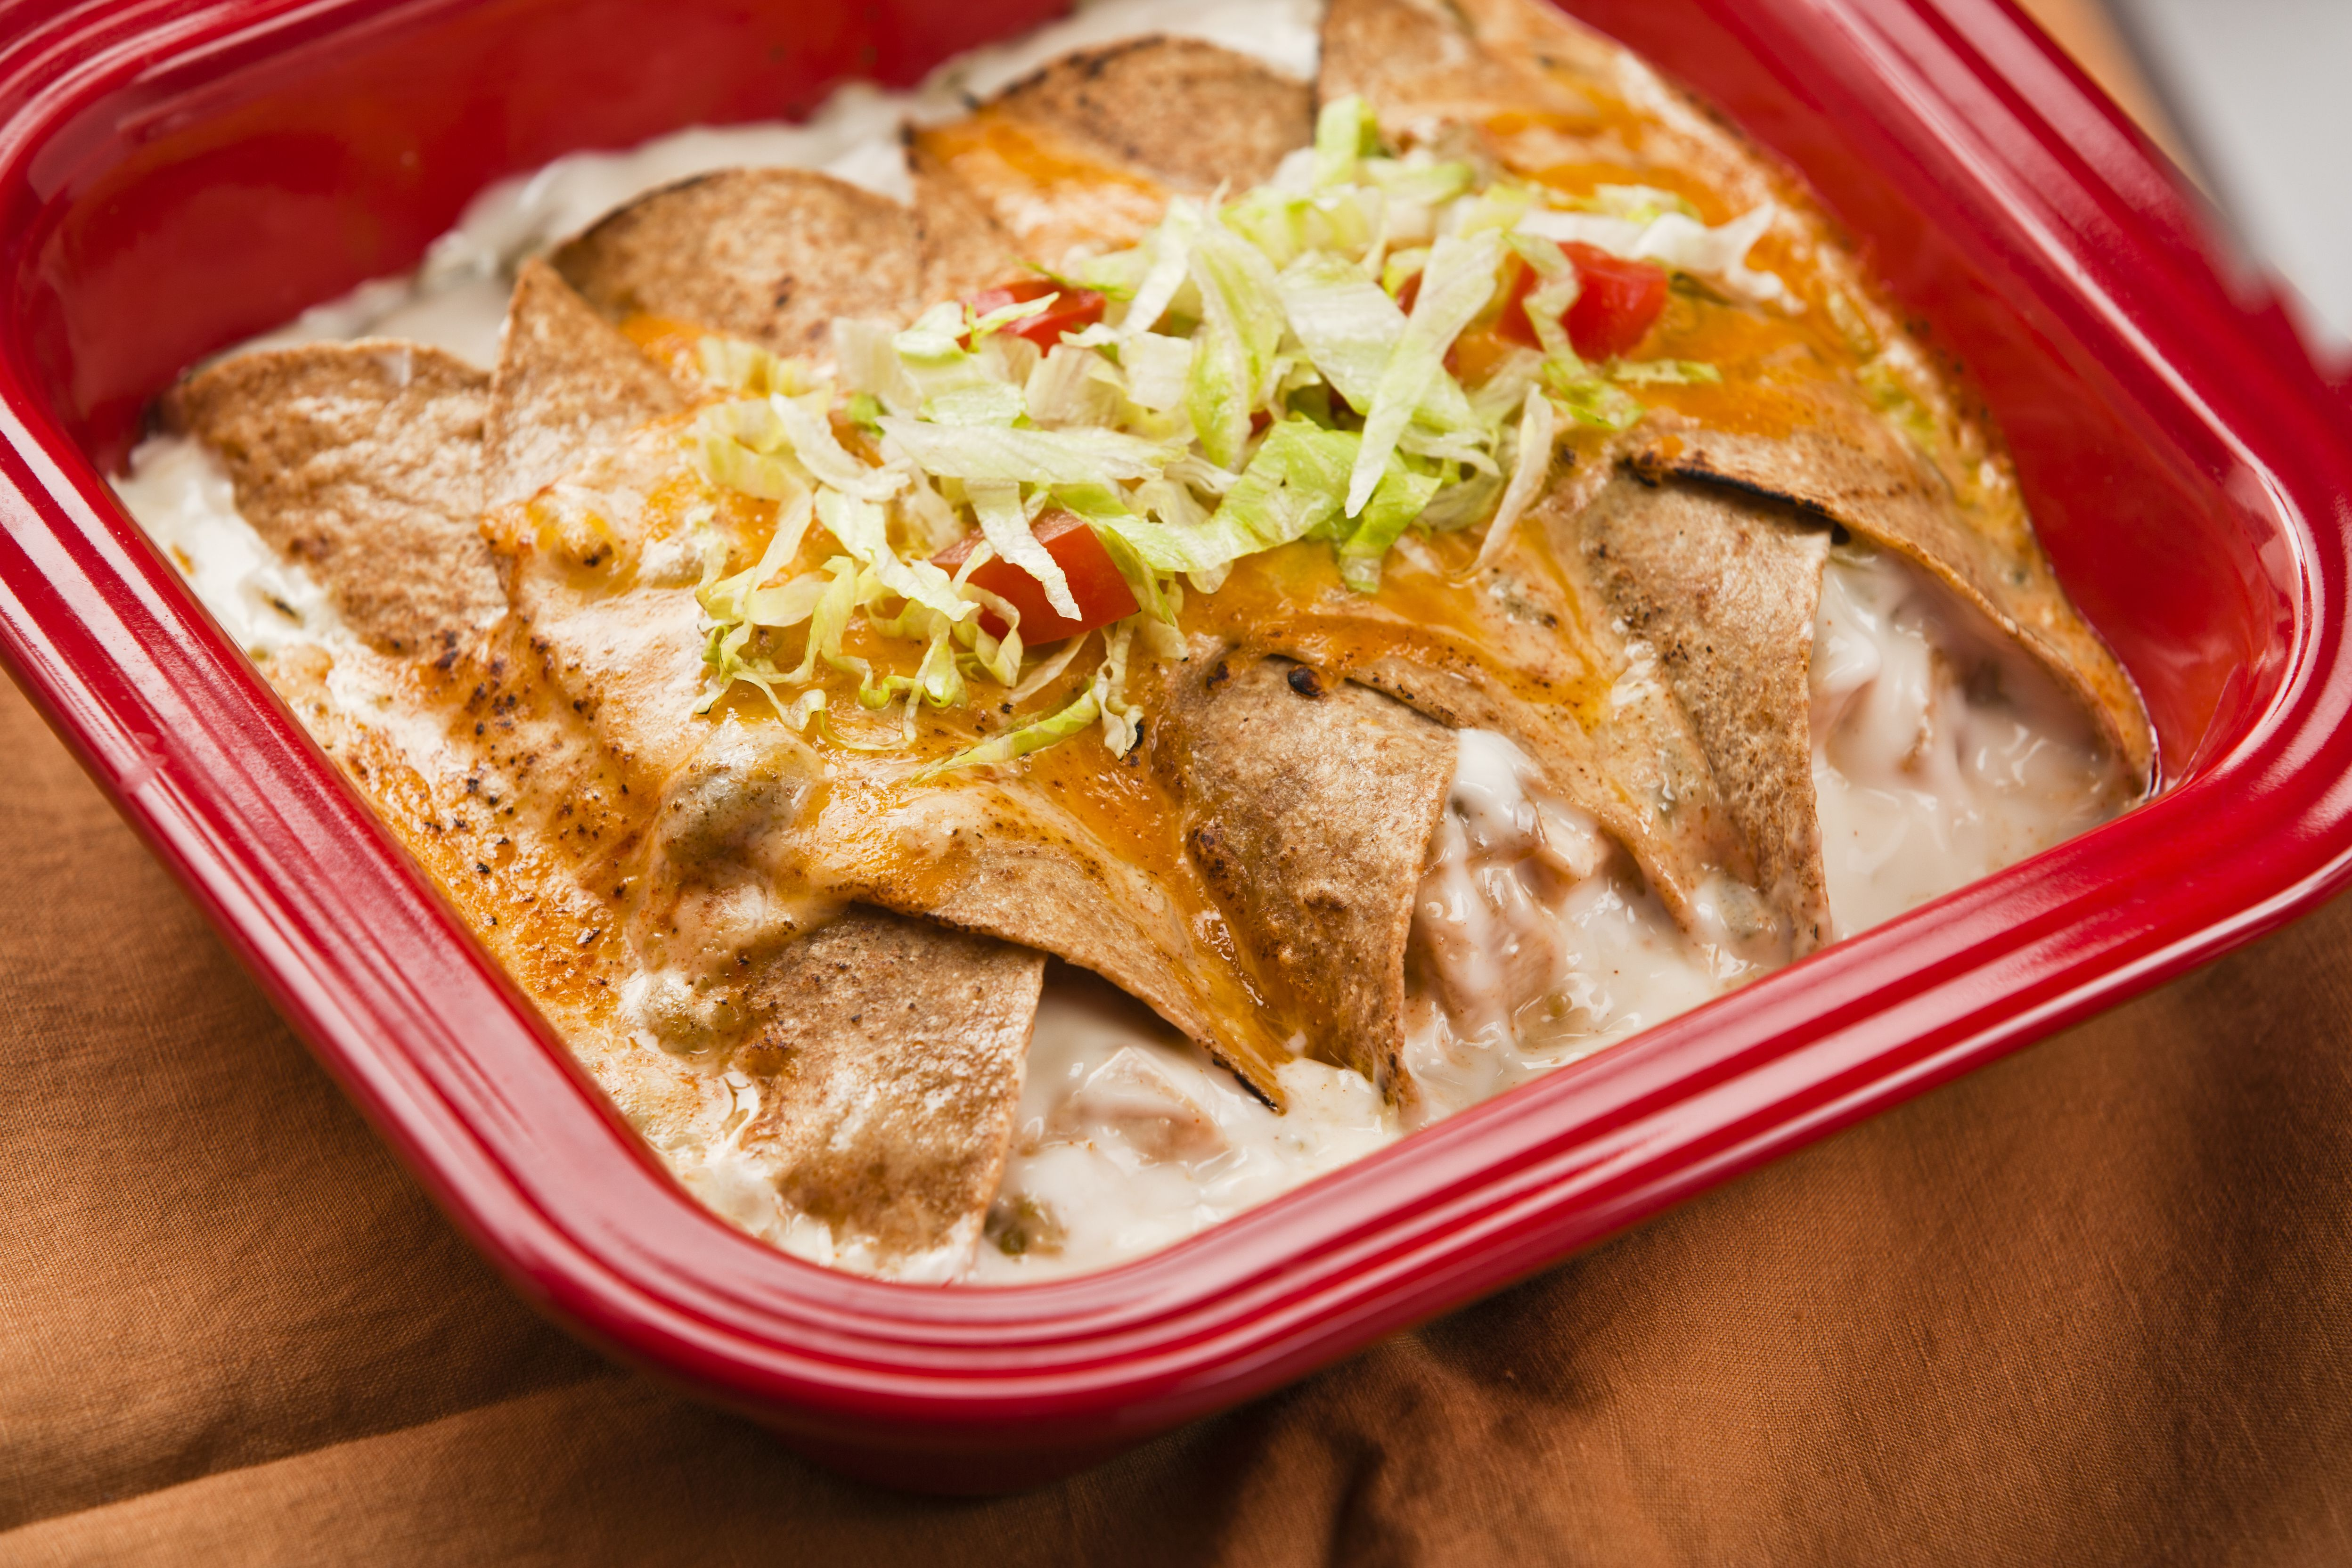 Dinner Recipes For Picky Eaters